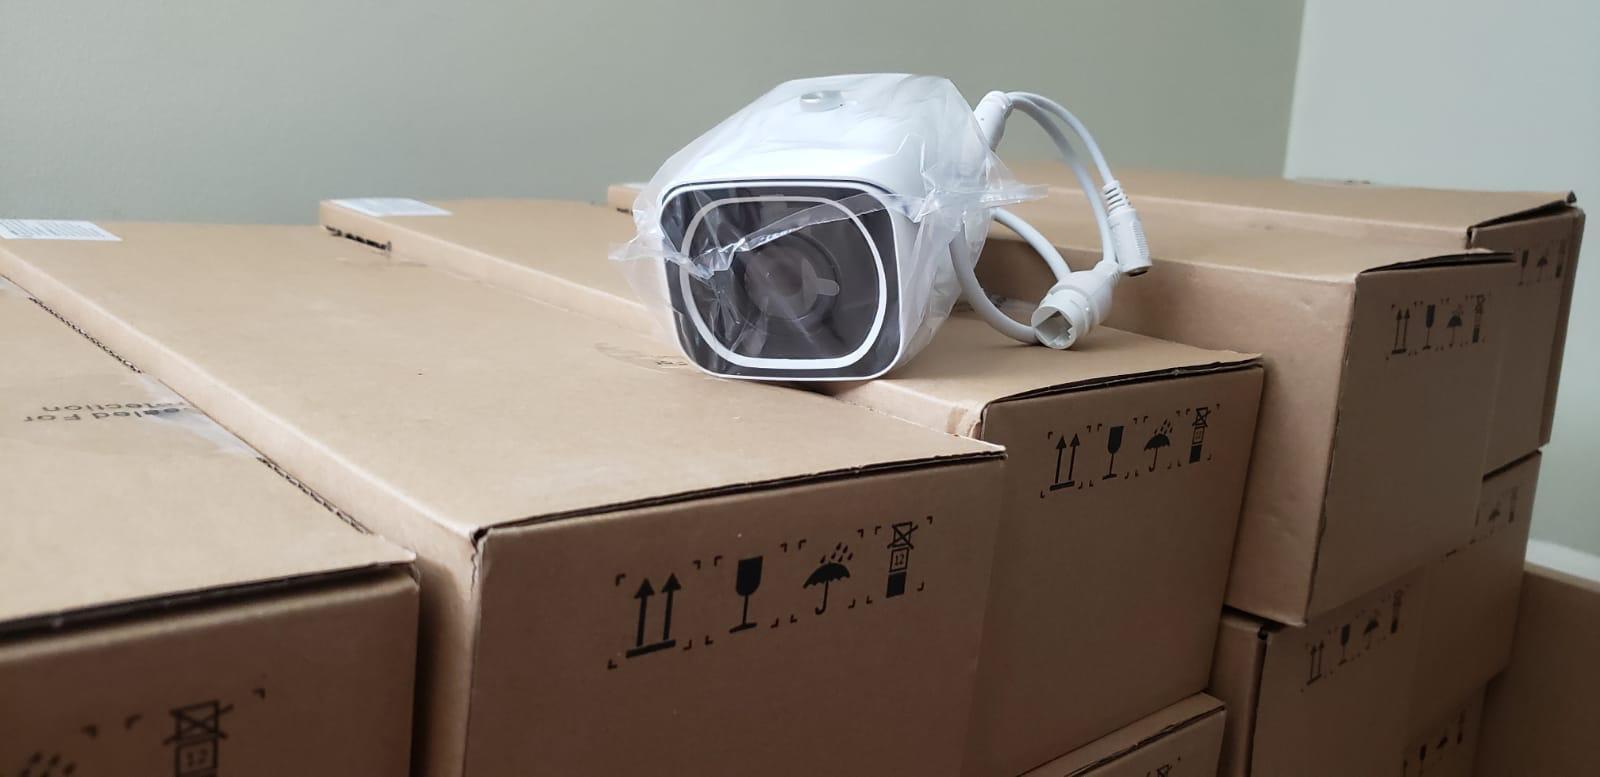 4K Security Cameras - Suppliers